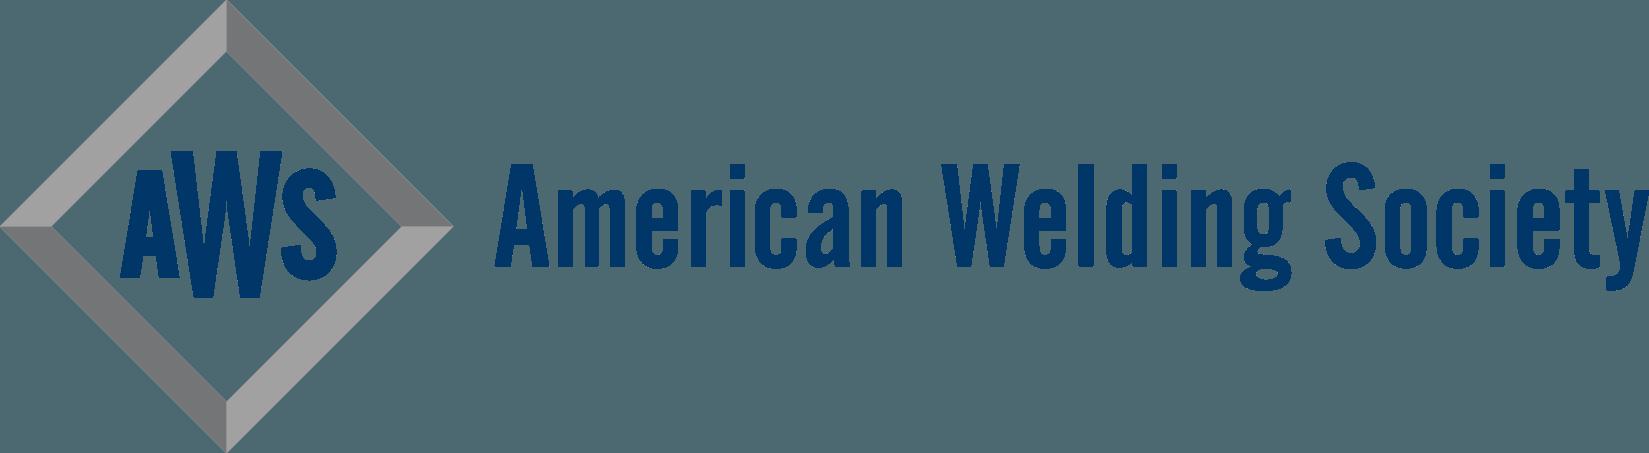 American-Welding-Society